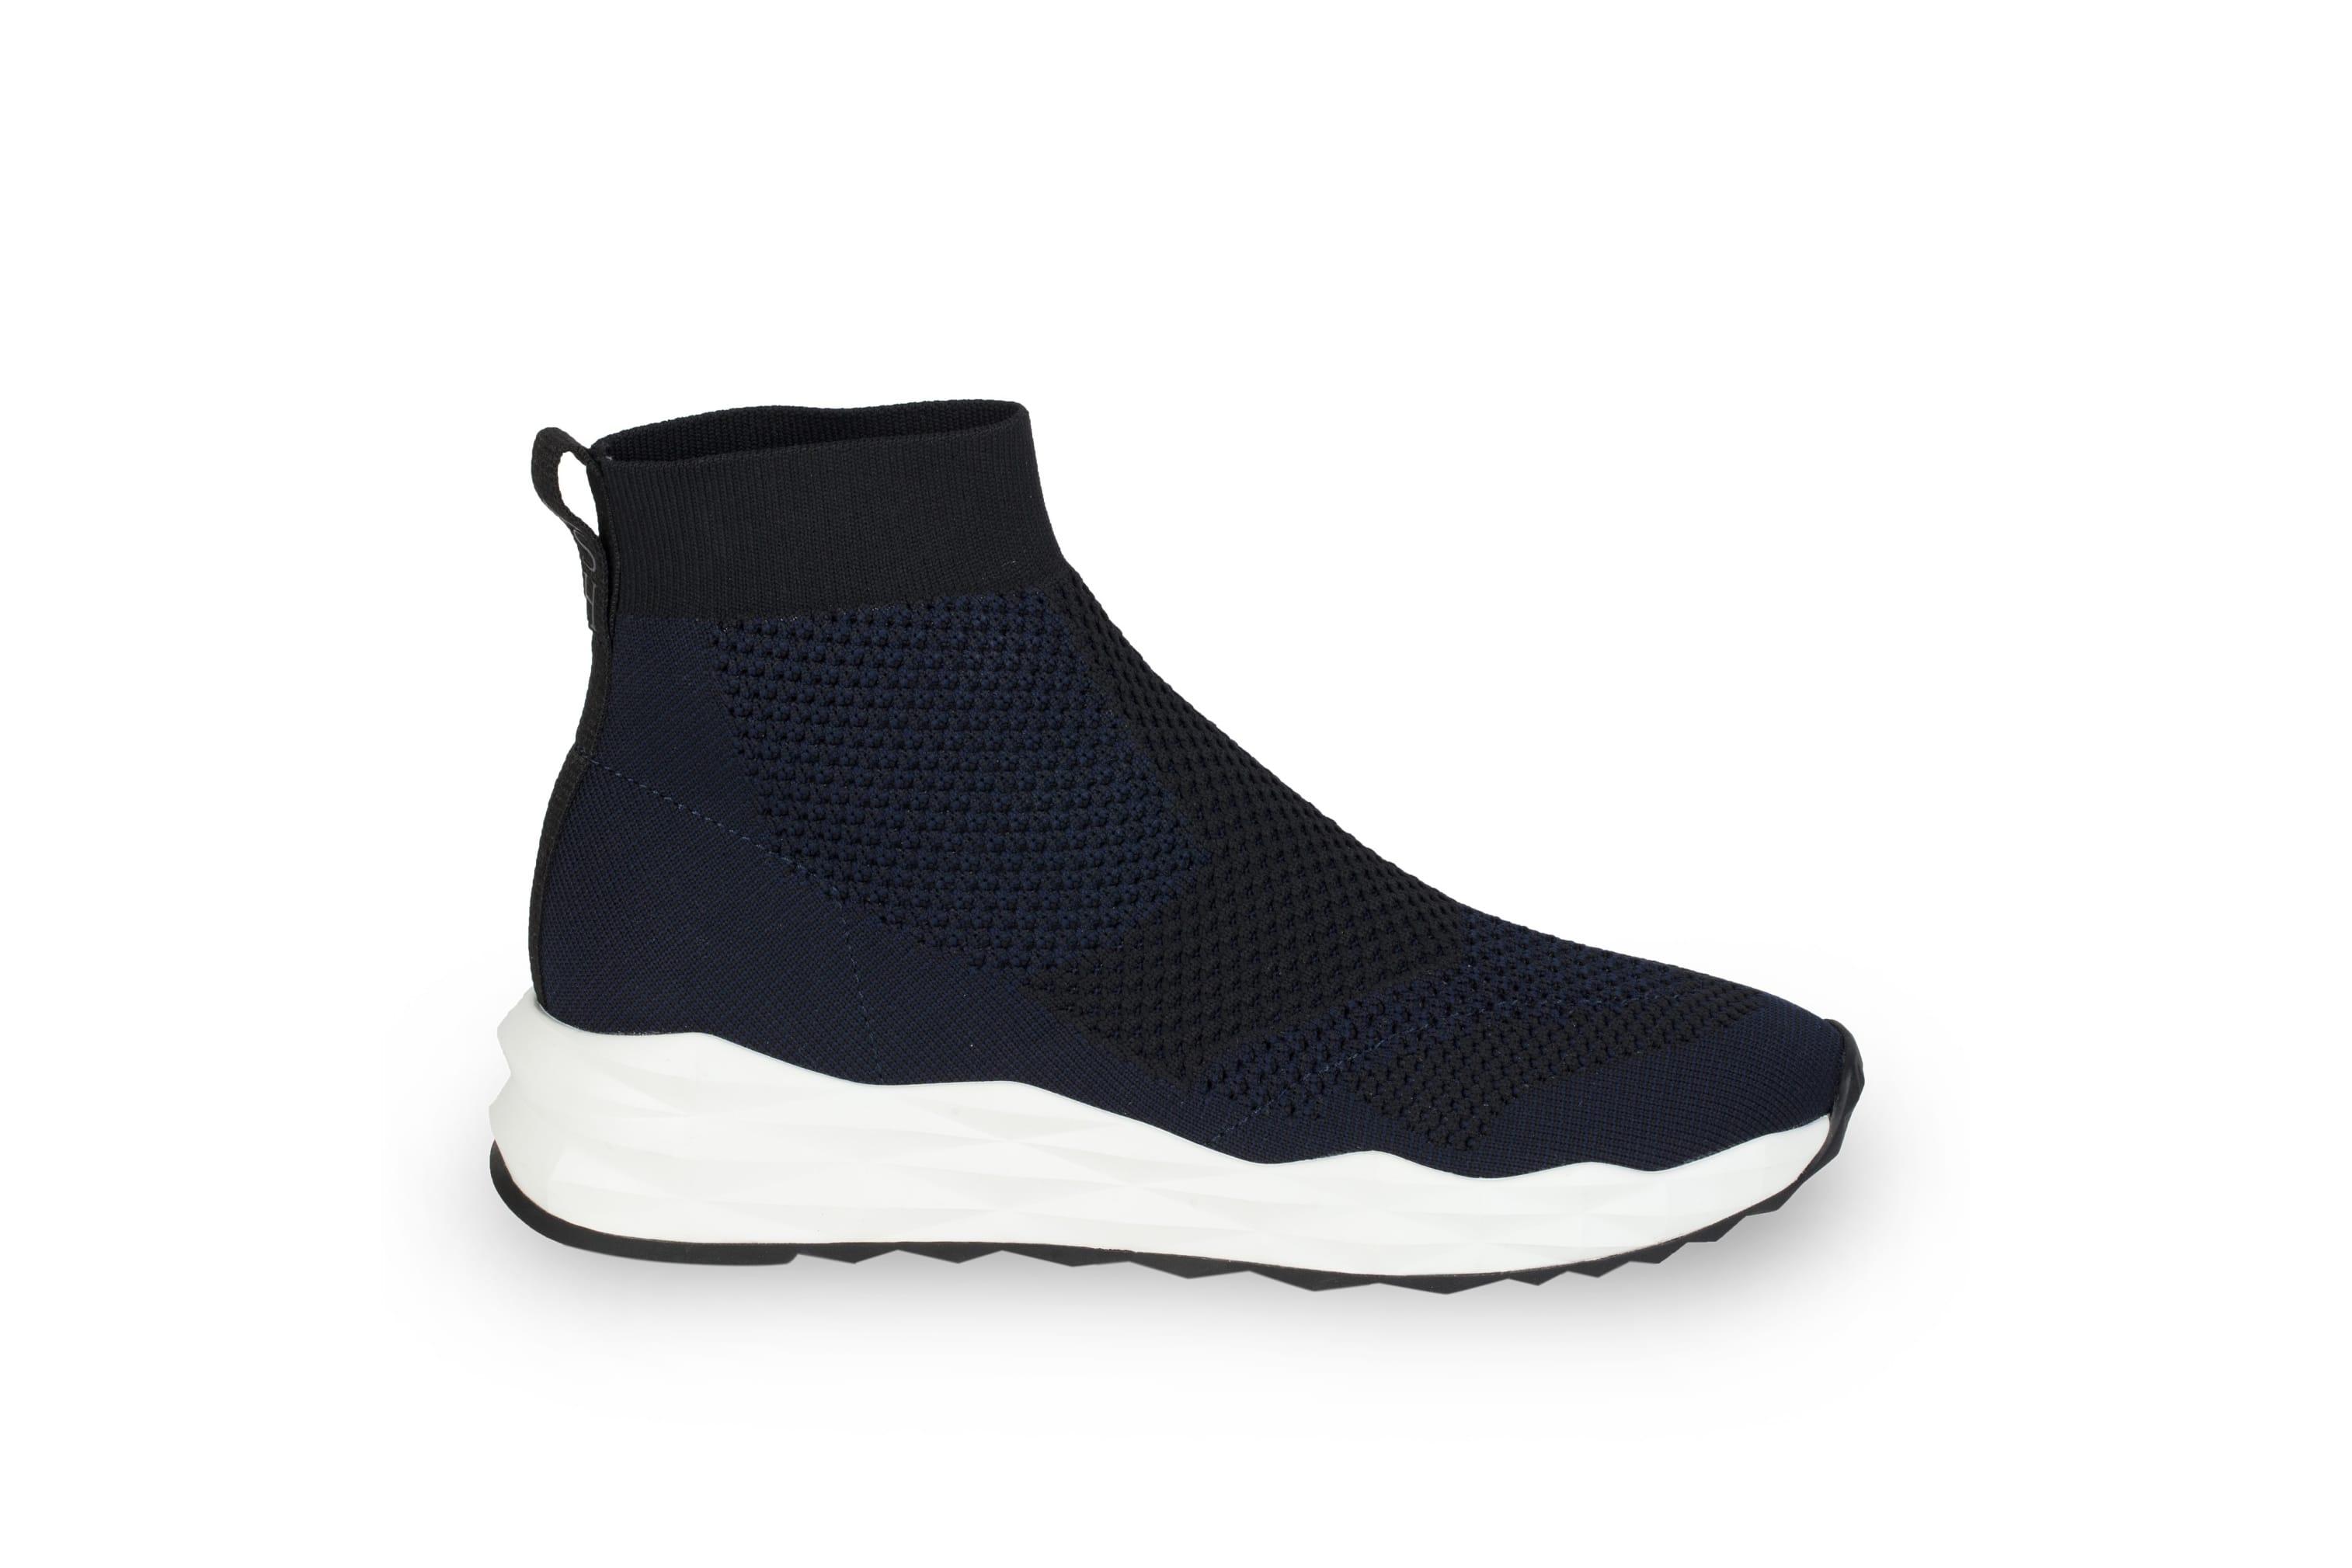 Balenciaga Triple-S Sneaker Rip-Off